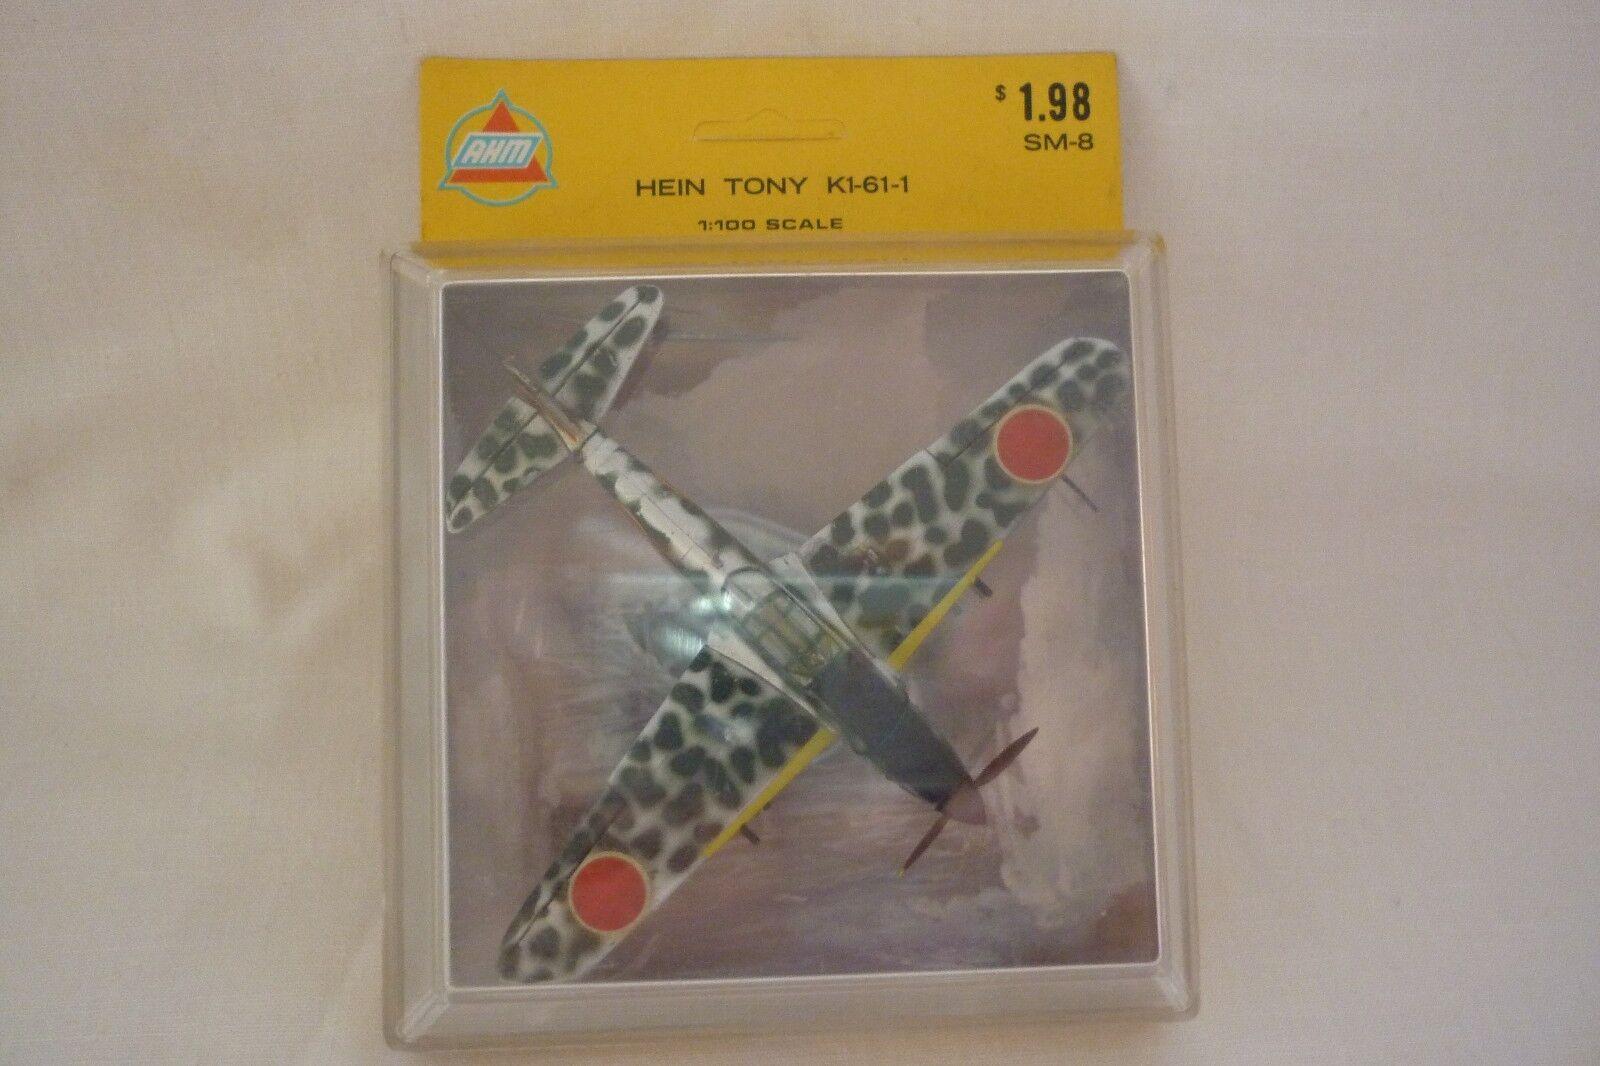 Ahm Modelo Avión - Escaparate Miniaturas Hein Tonky Tonky Tonky K1 61 1 1 100 Emb.orig cbb2b2